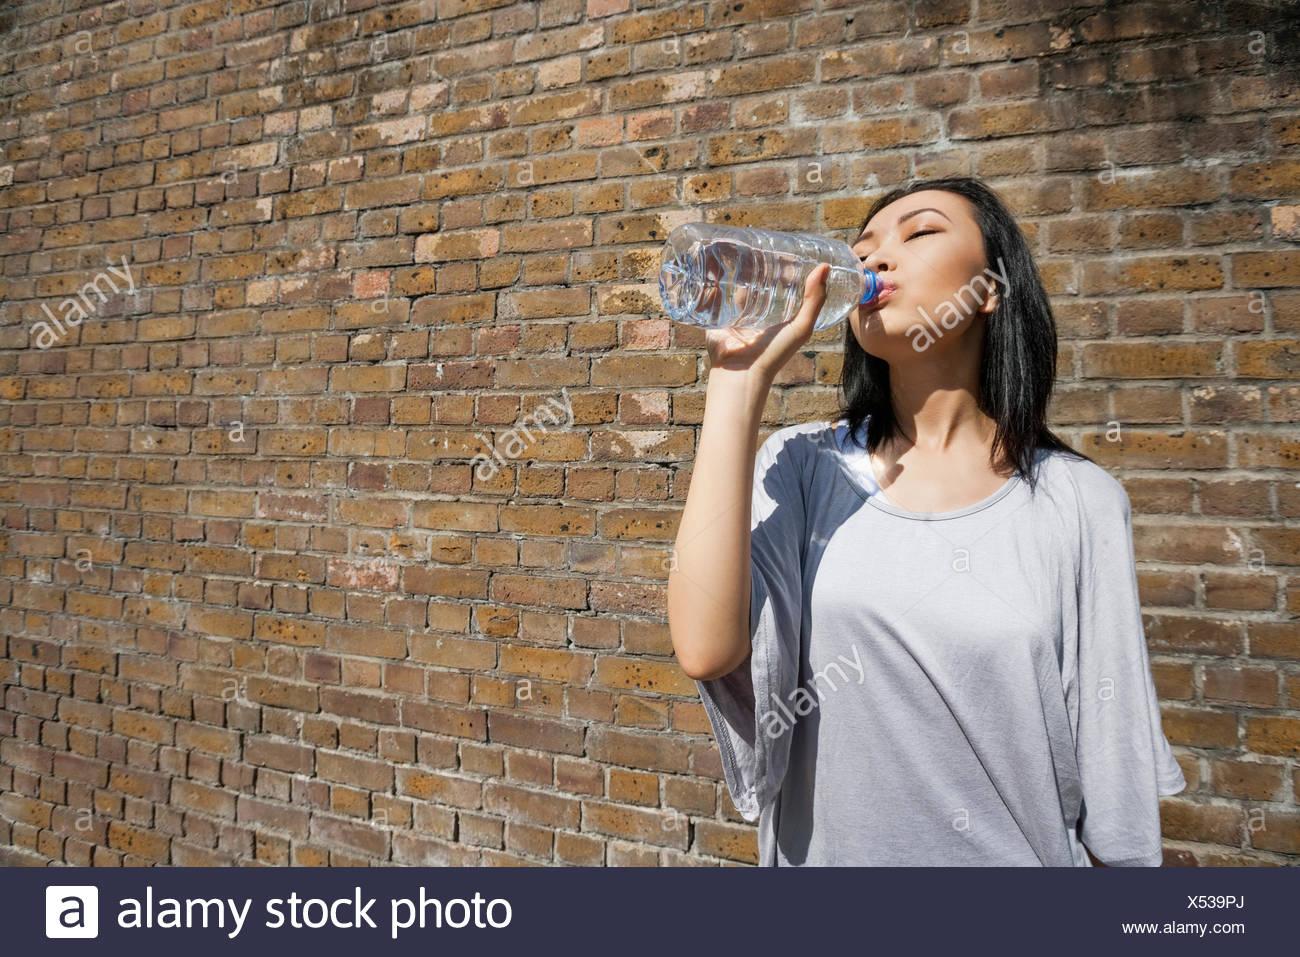 Hermosa joven agua potable contra la pared de ladrillo Imagen De Stock